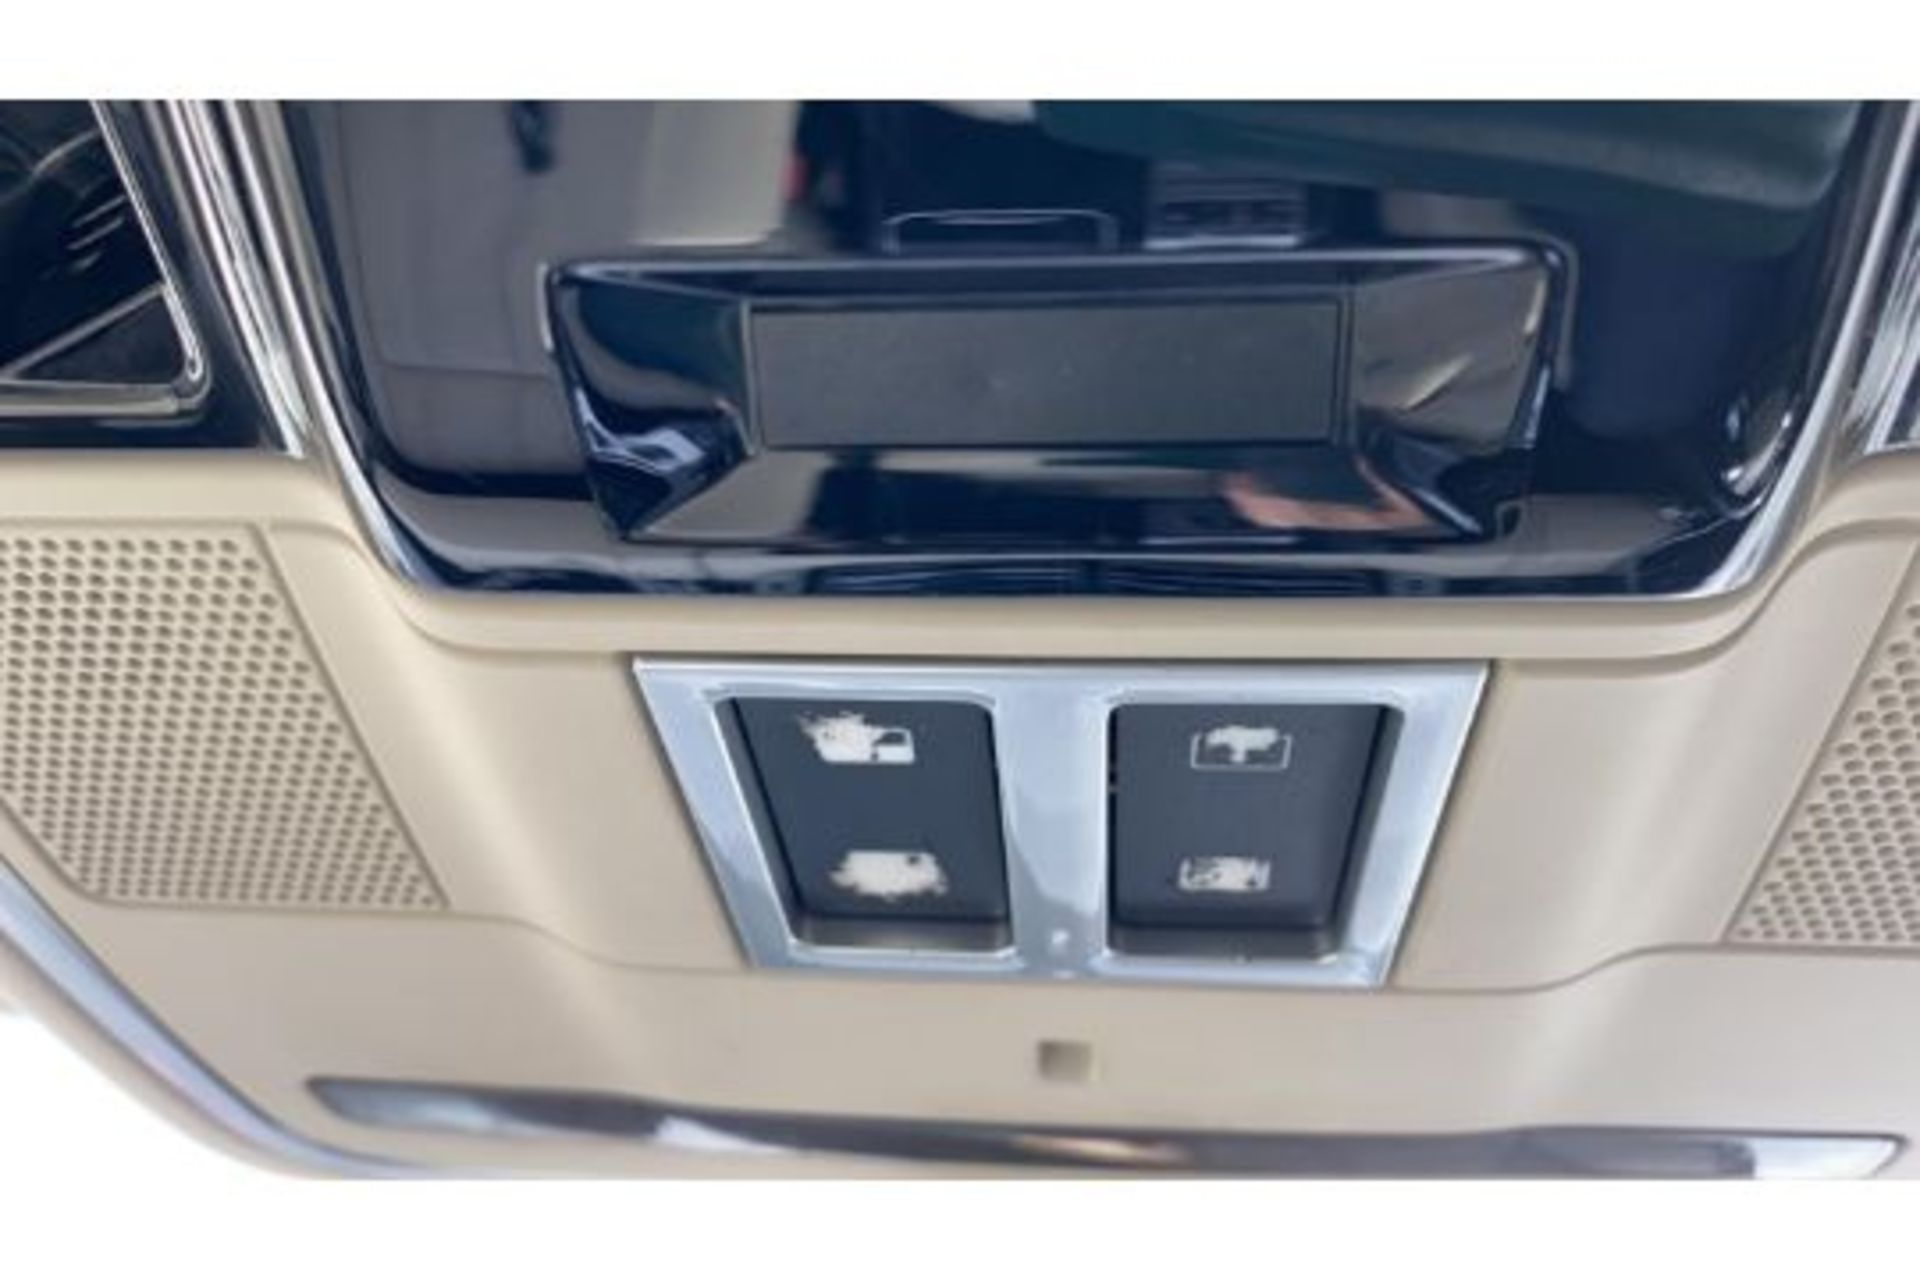 Range Rover Vogue 3.0 TDV6 SE Auto - Black Pack - NEW SHAPE - FULLY LOADED - Pan Roof - Image 25 of 30